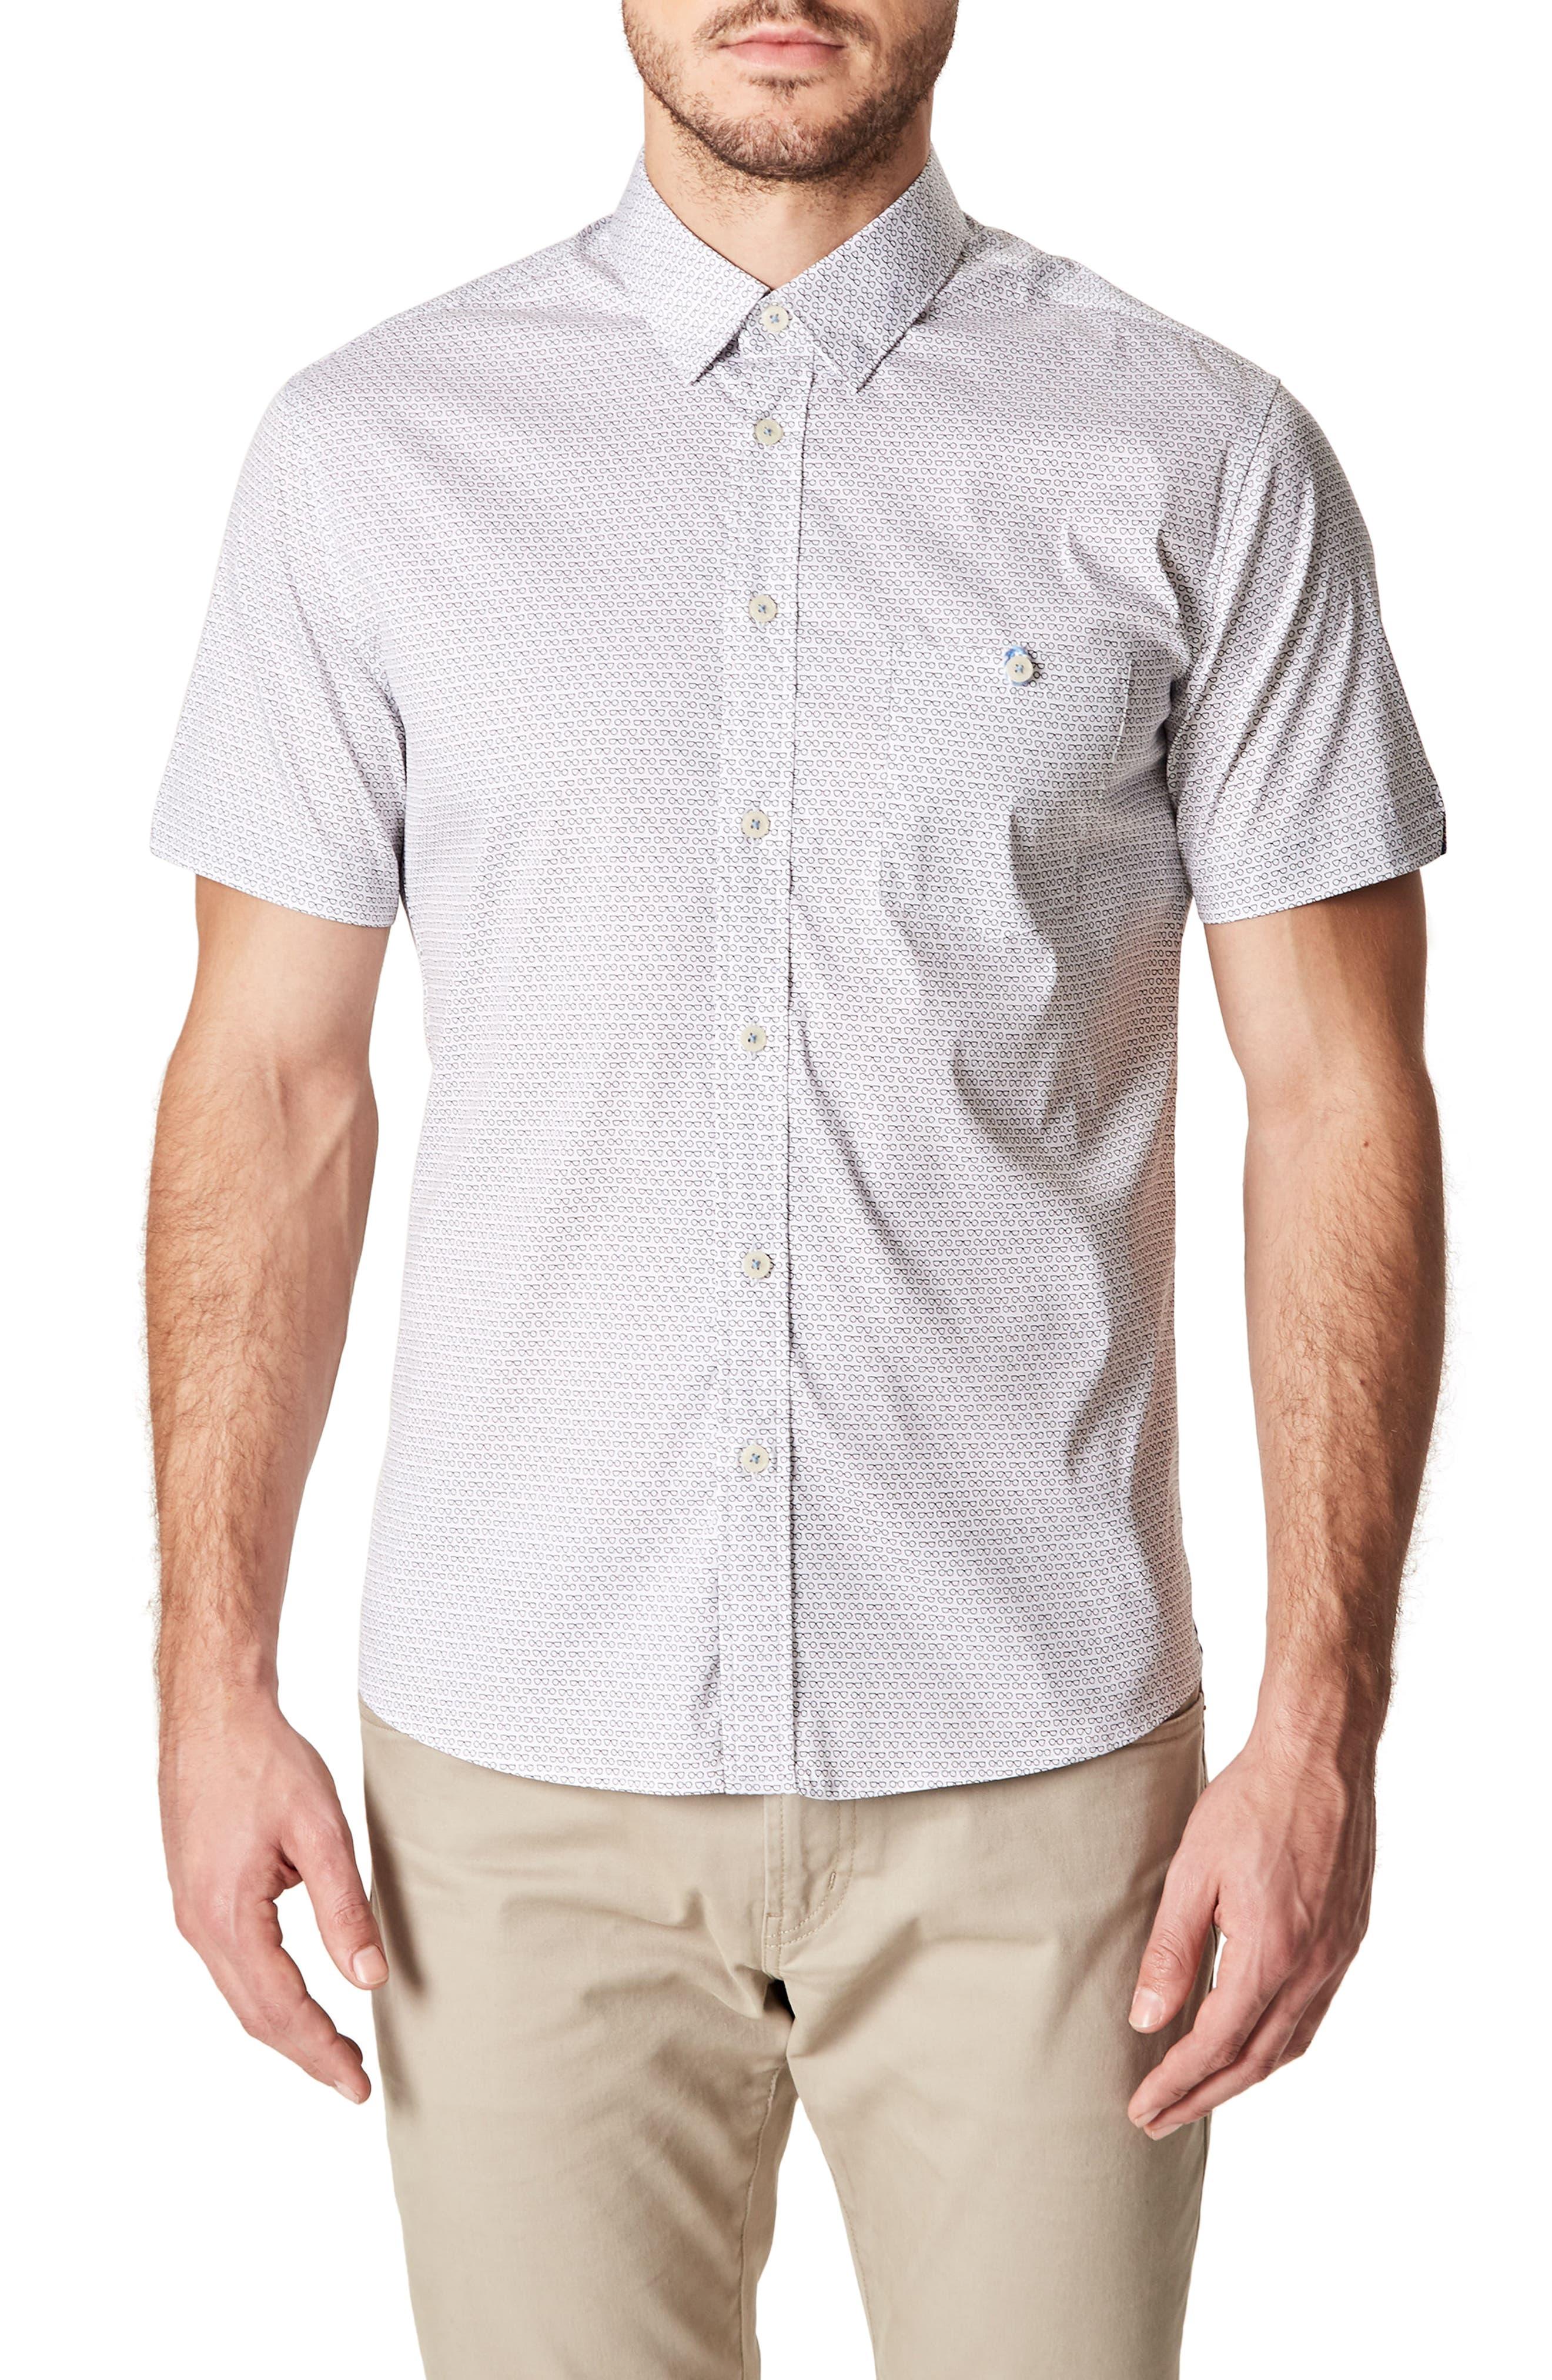 Bright Life Woven Shirt,                         Main,                         color, WHITE